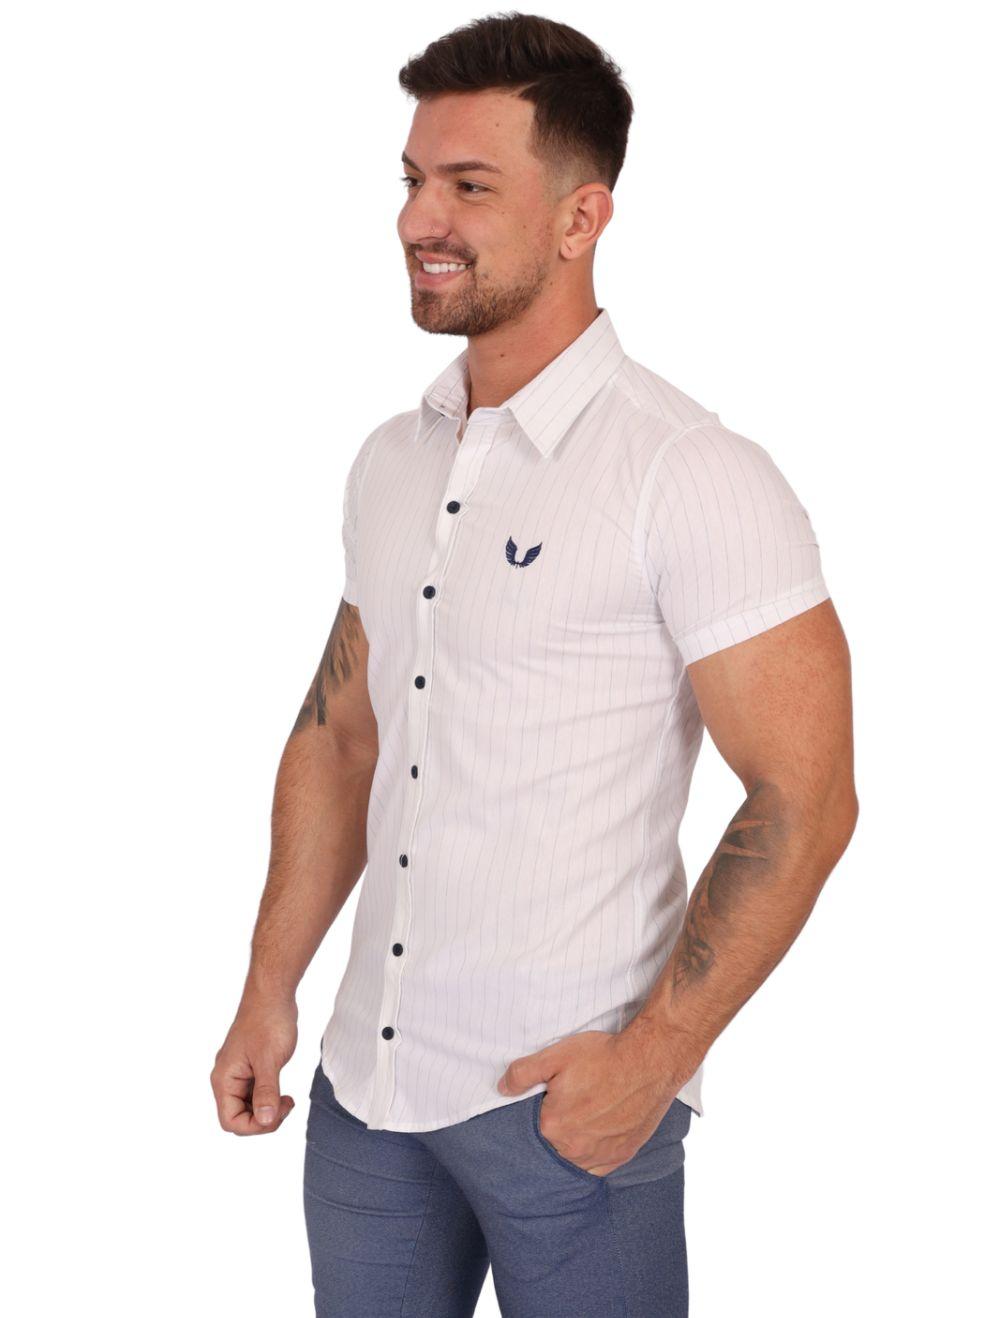 Camisa Masculina Manga Curta Branca com Listras